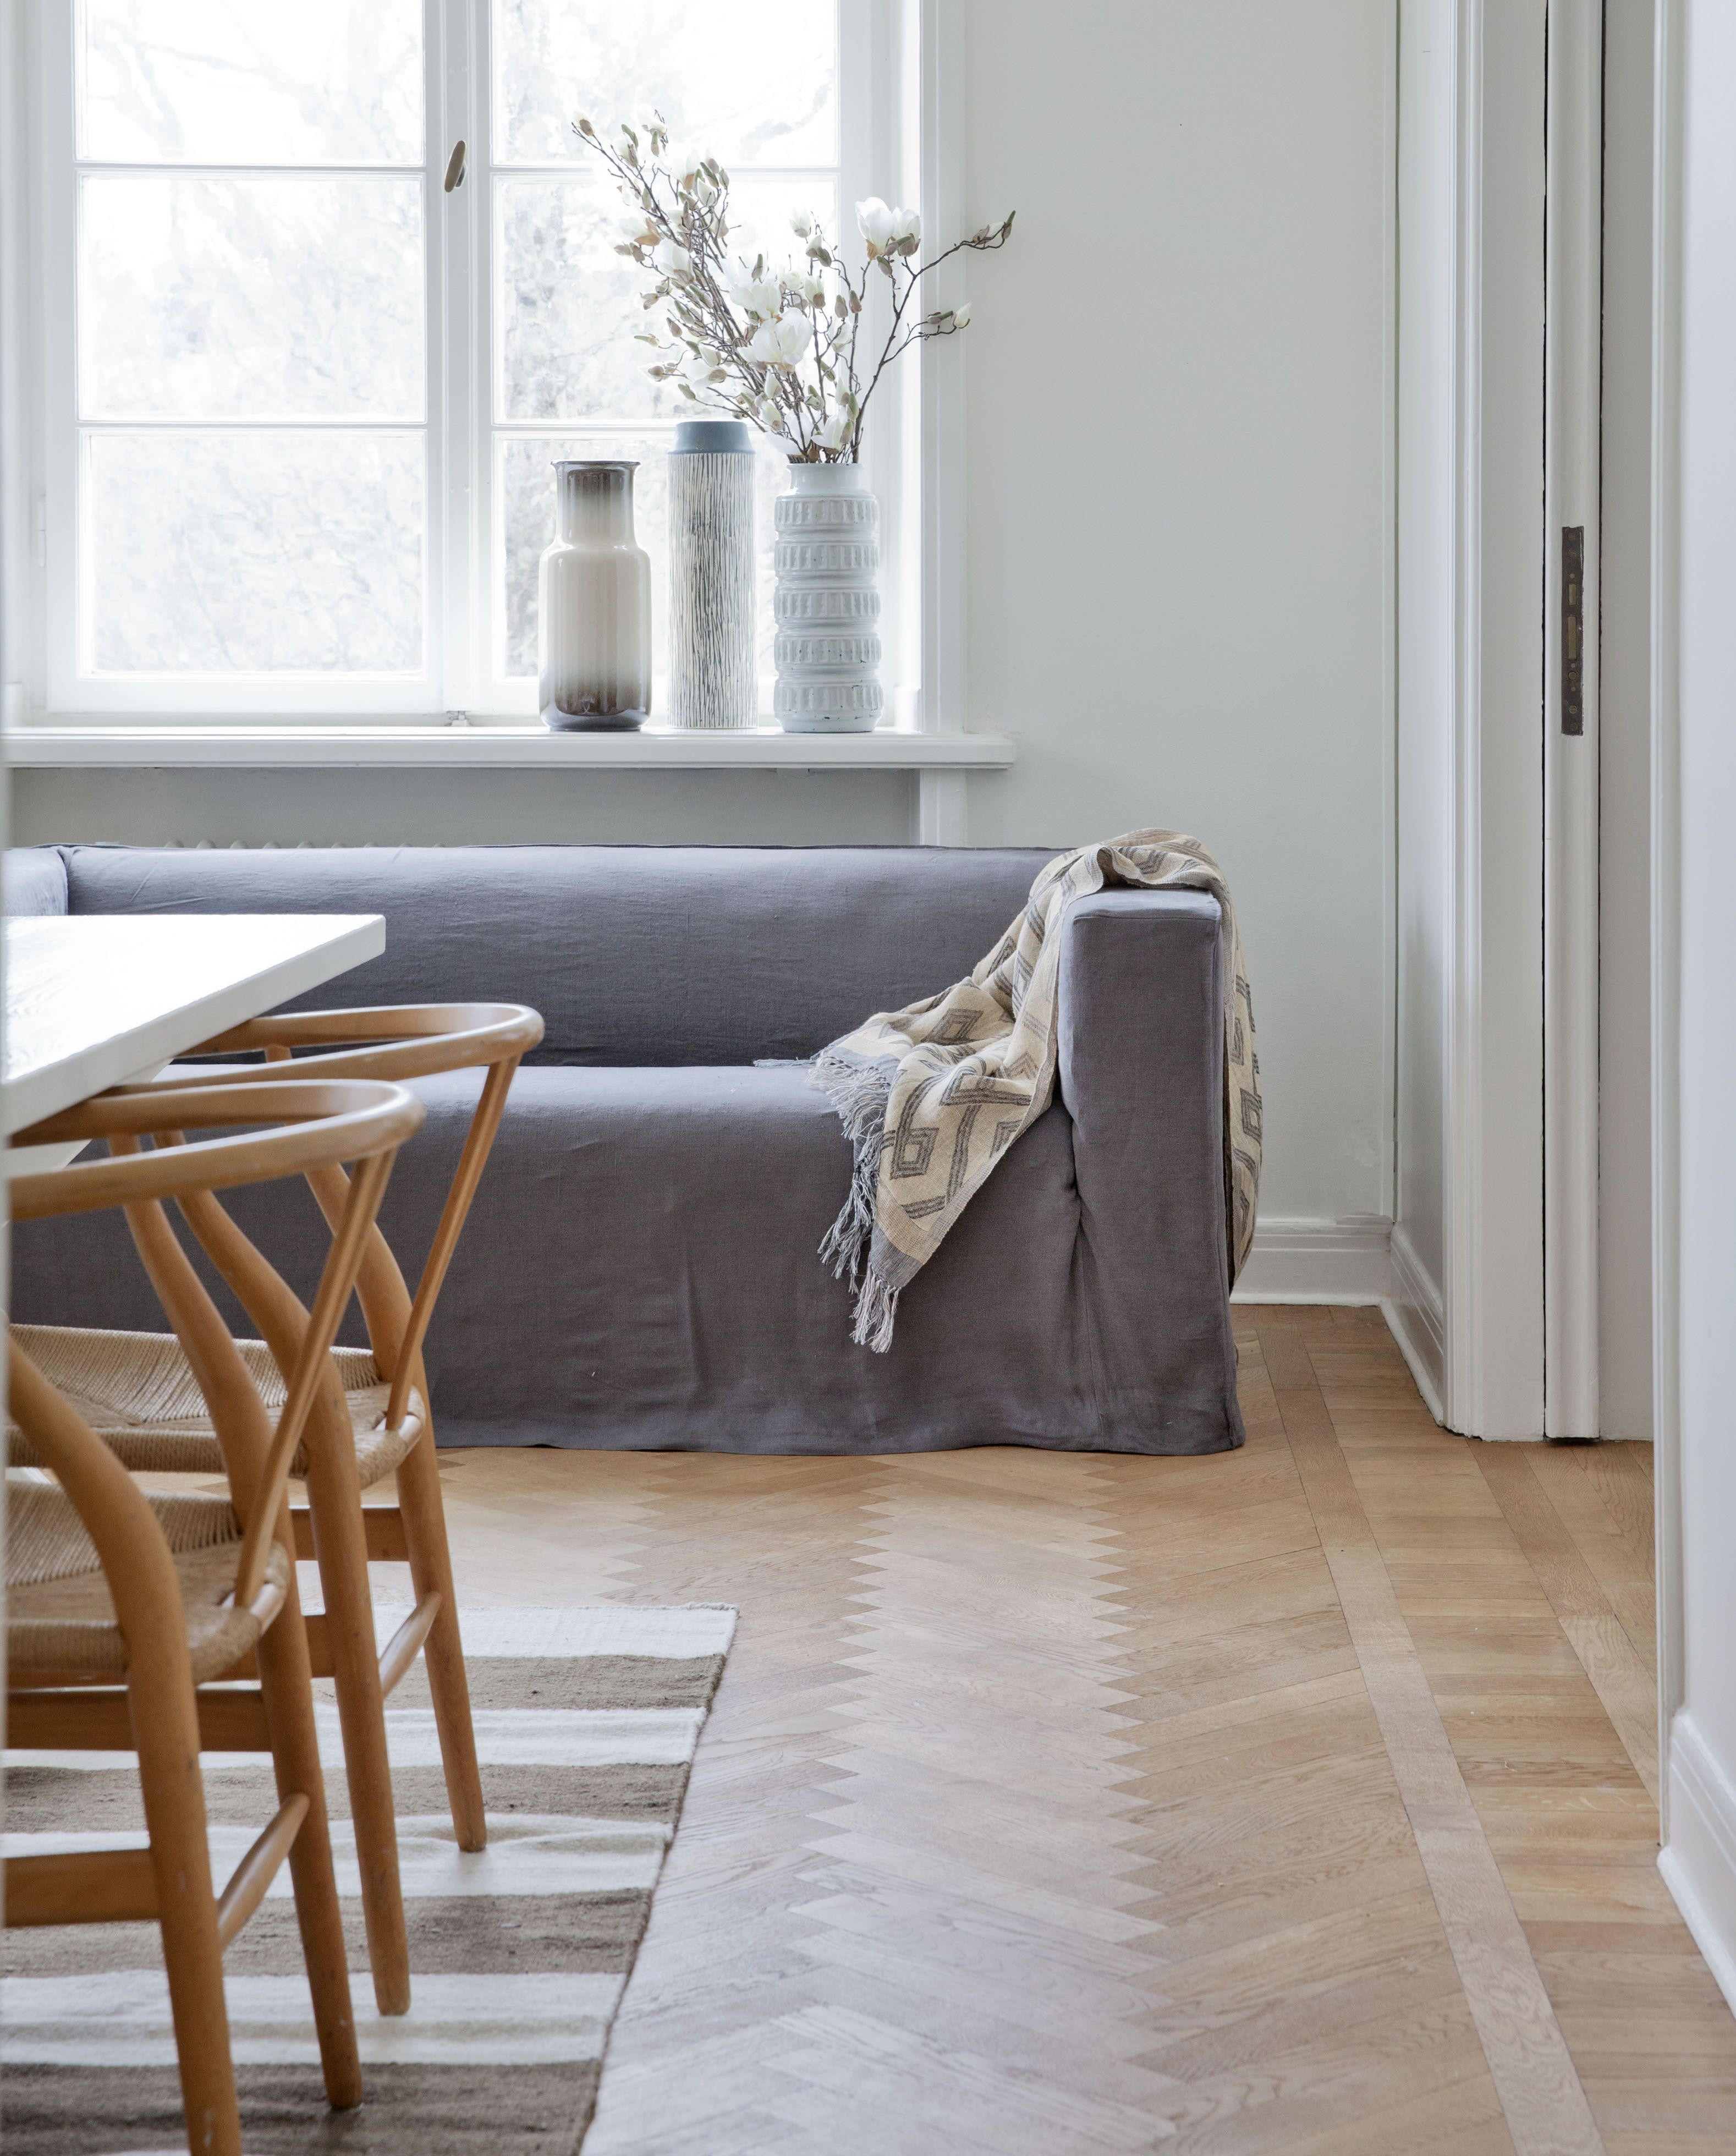 Loose Chair Covers Ikea Beautiful Cover Hire Oxfordshire Klippan 2 Seater Sofa Fit Urban U R B A N